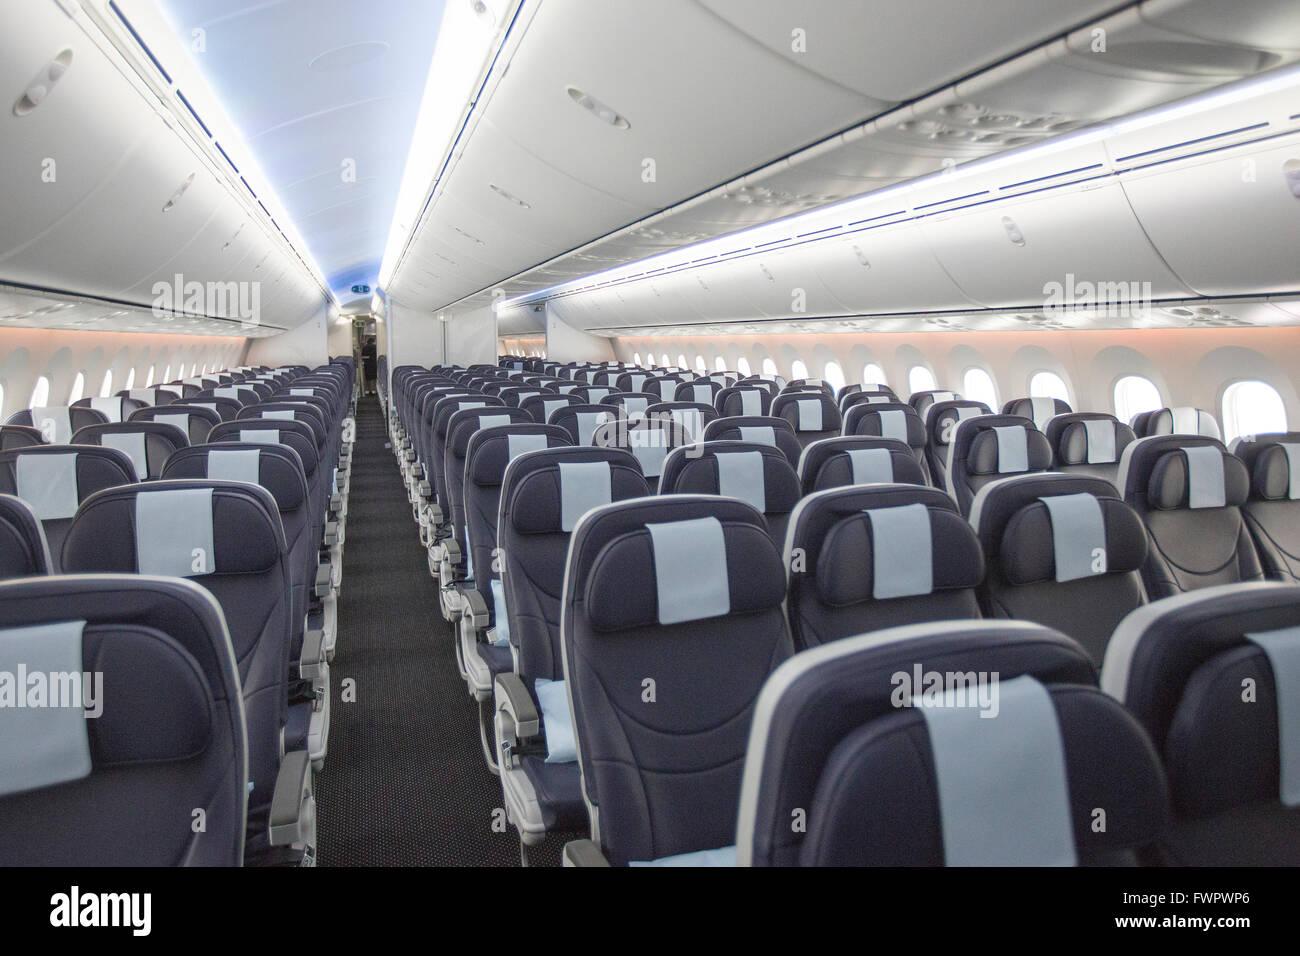 Stunning Interieur Boeing 787 Dreamliner Photos - Trend Ideas 2018 ...